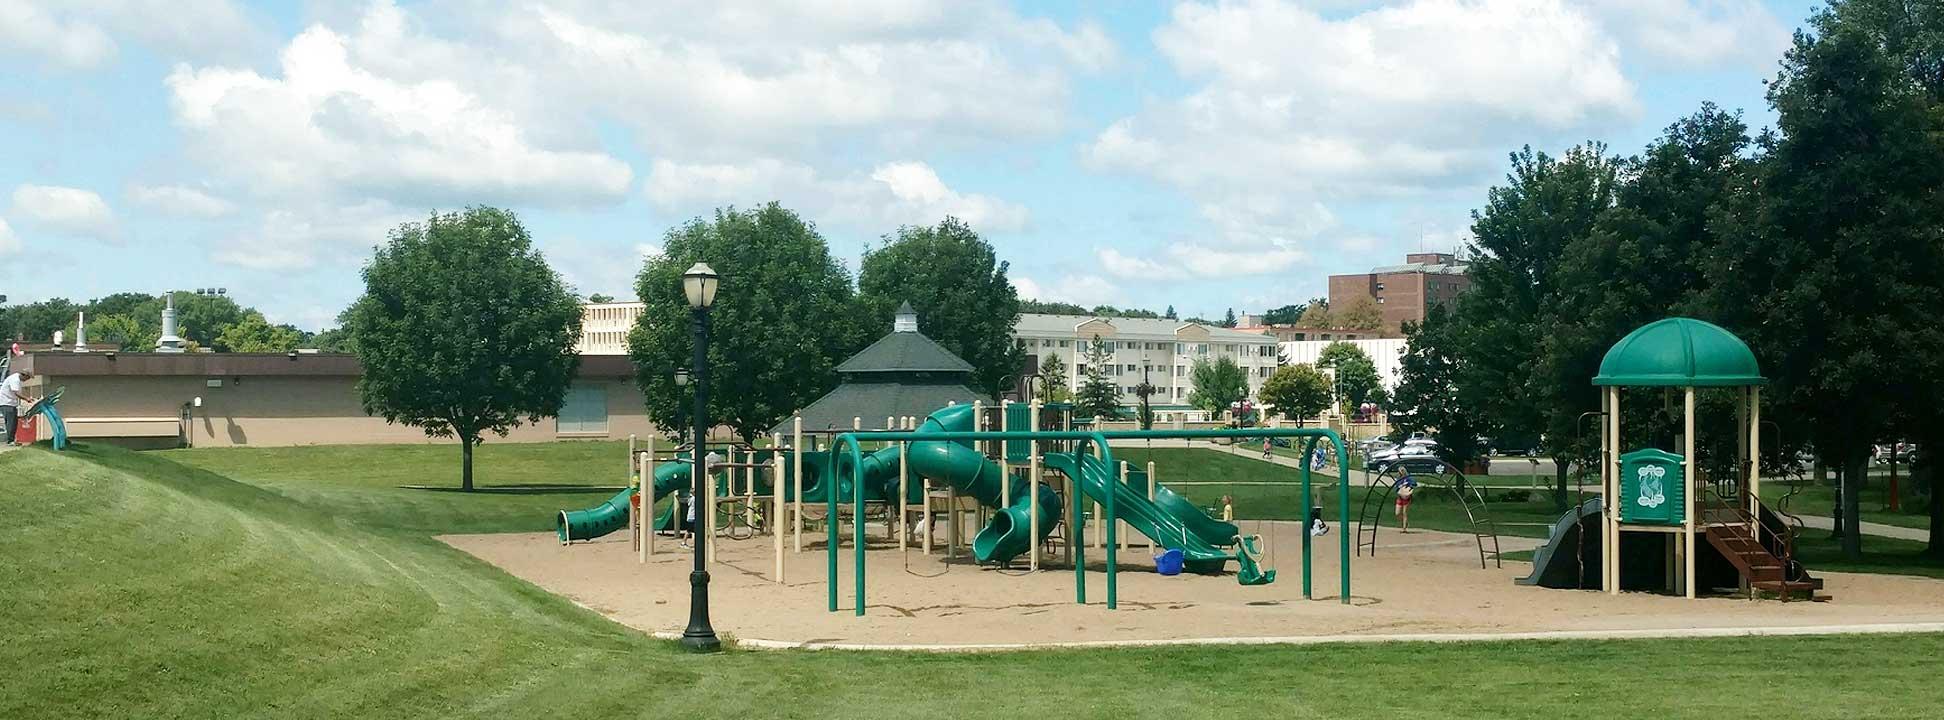 Discover Austin Parks